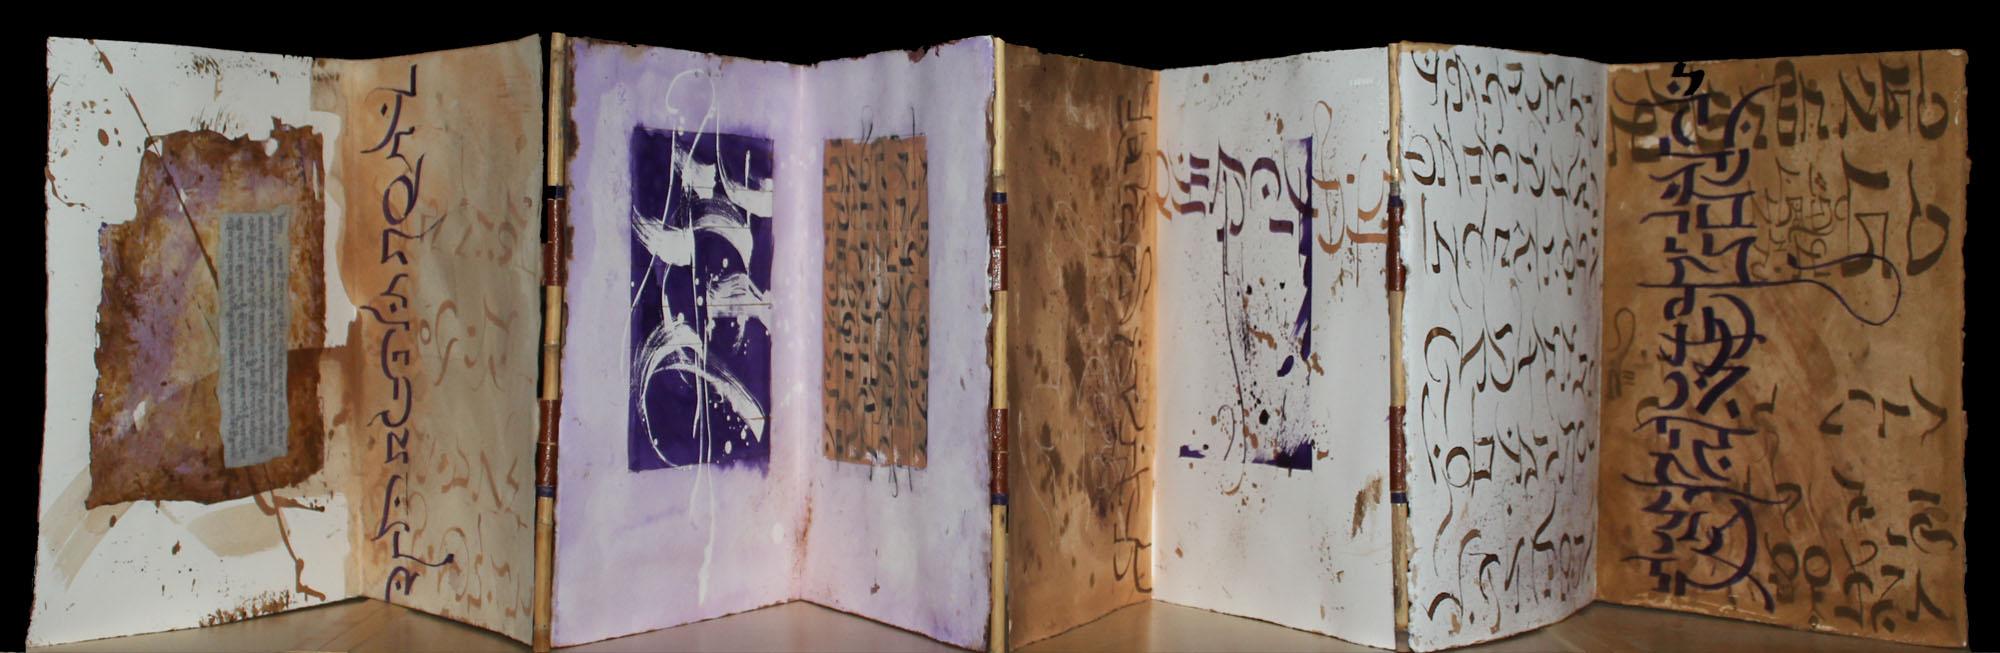 Wordforms, artist's book, by Joan Machinchick